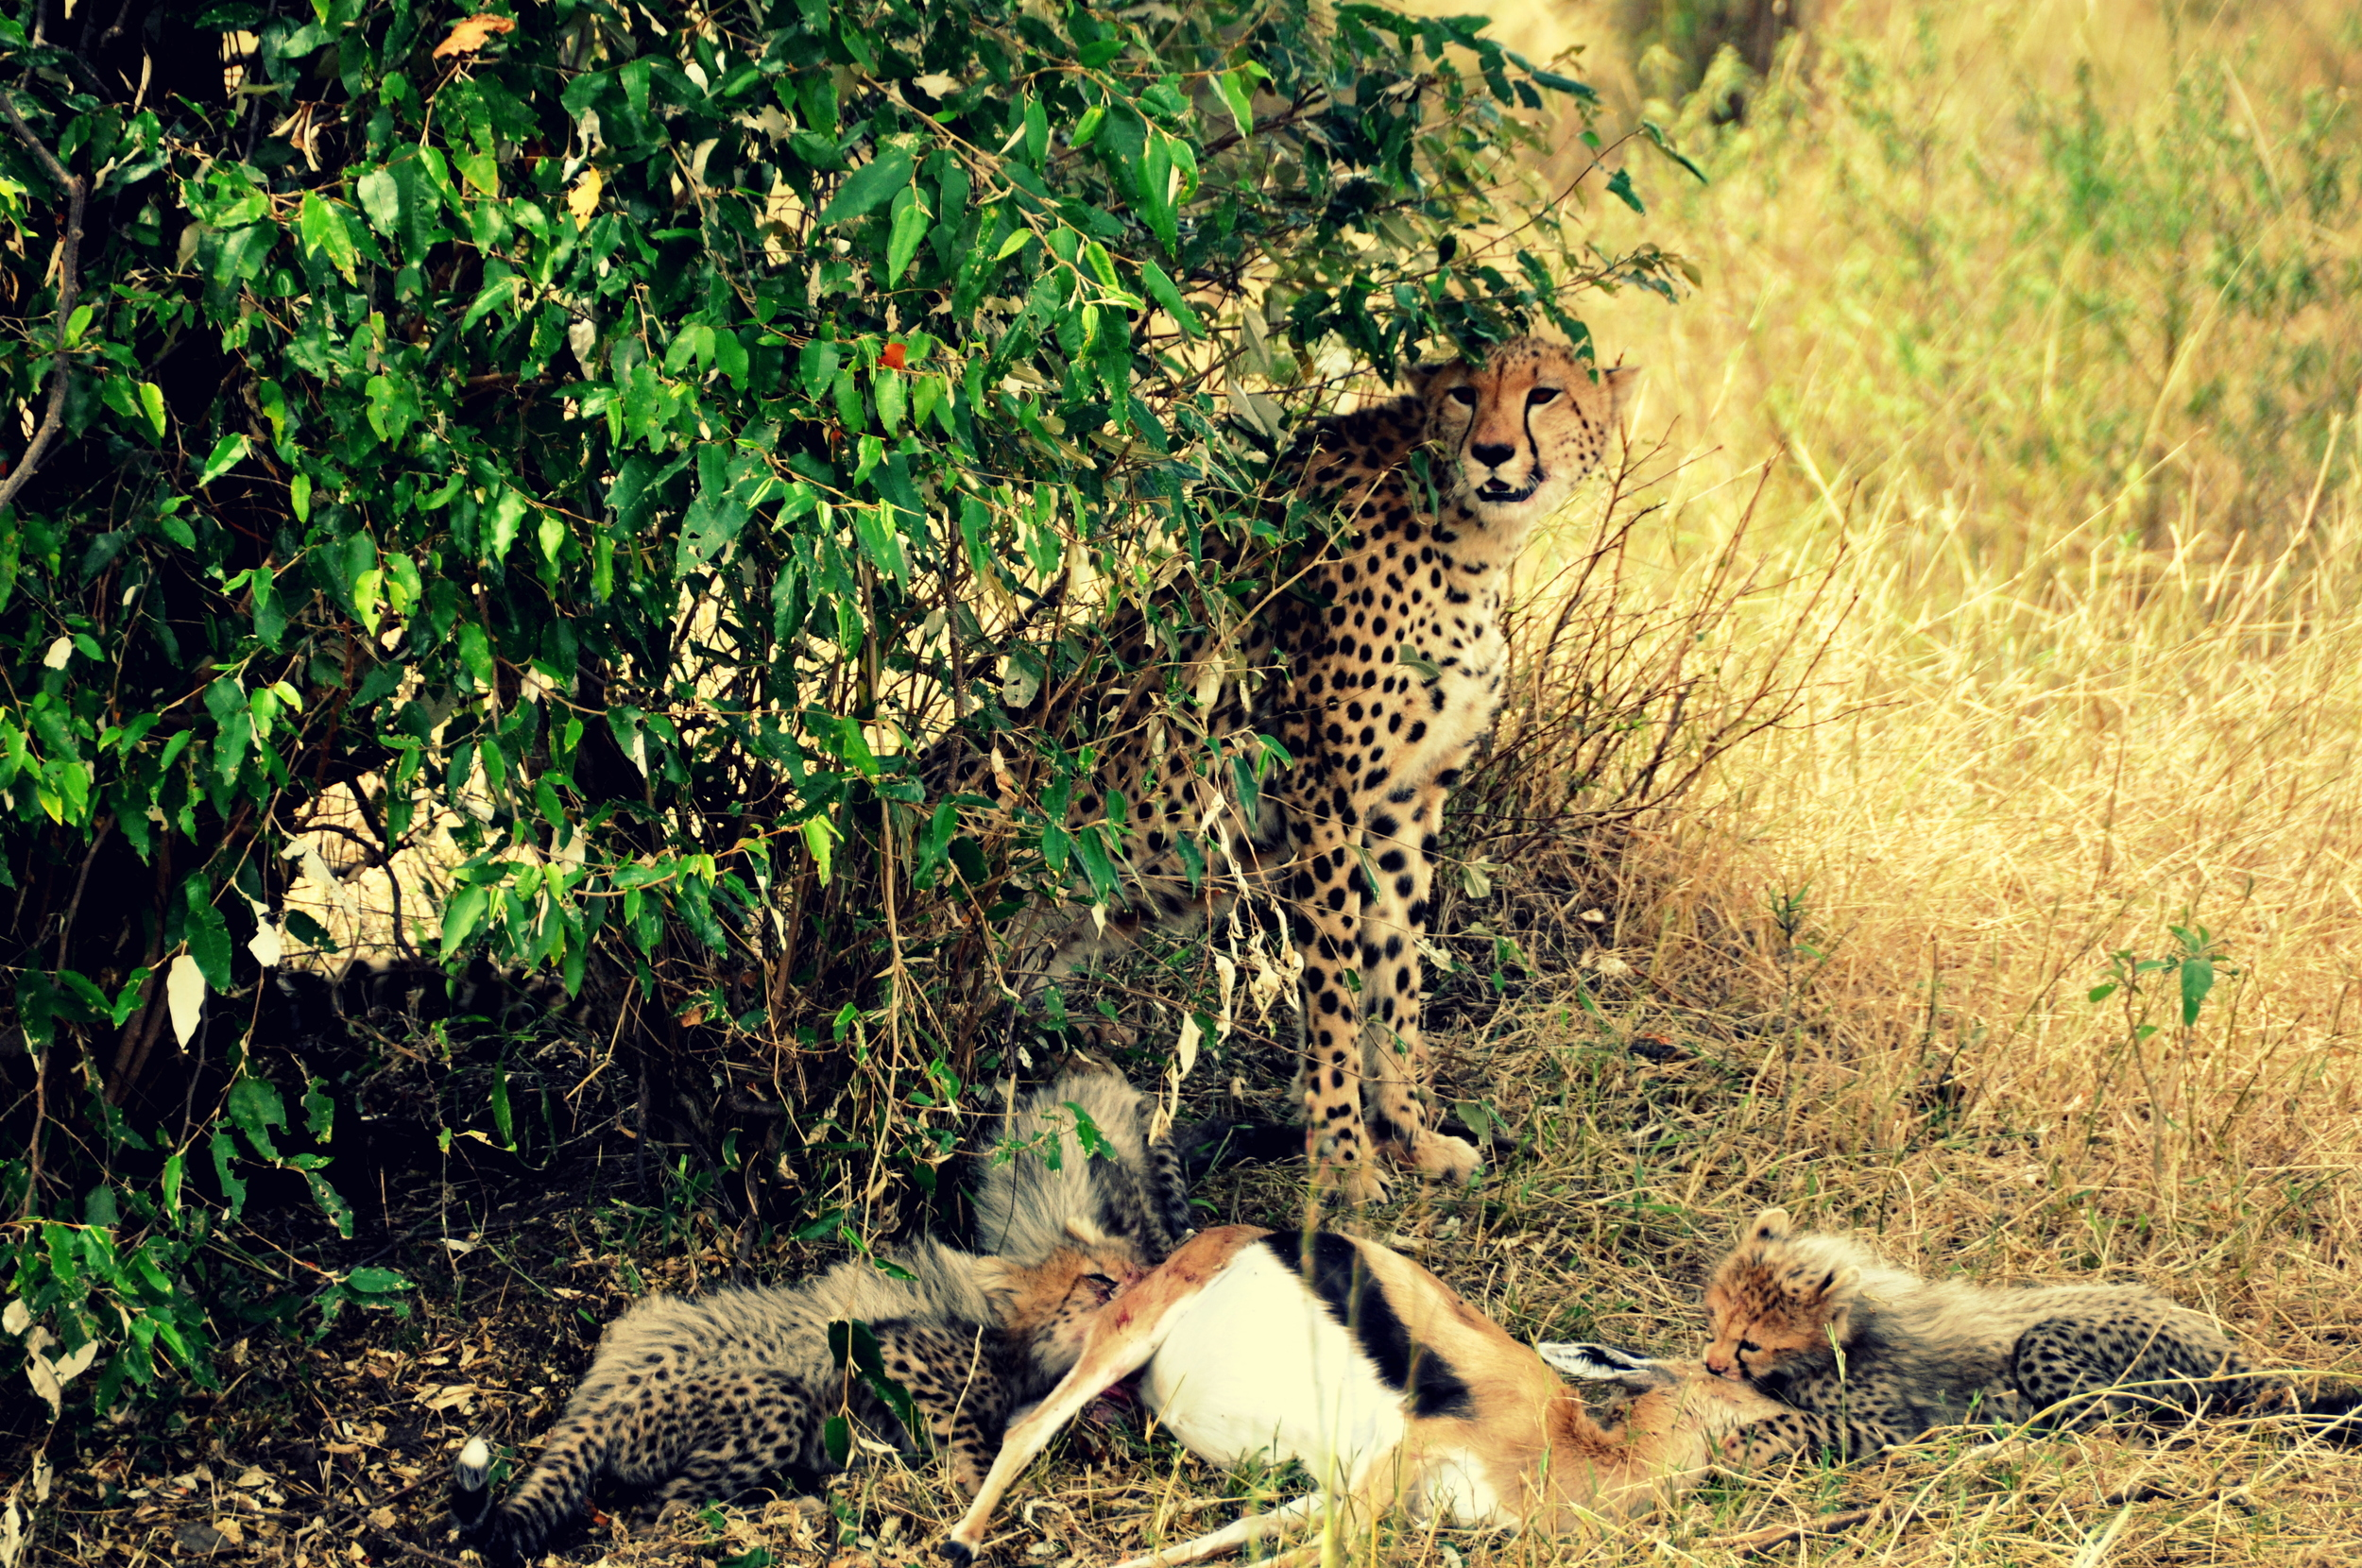 Cheetah, thomson Gazelle, cubs in Maasai Mara, Kenya, Africa